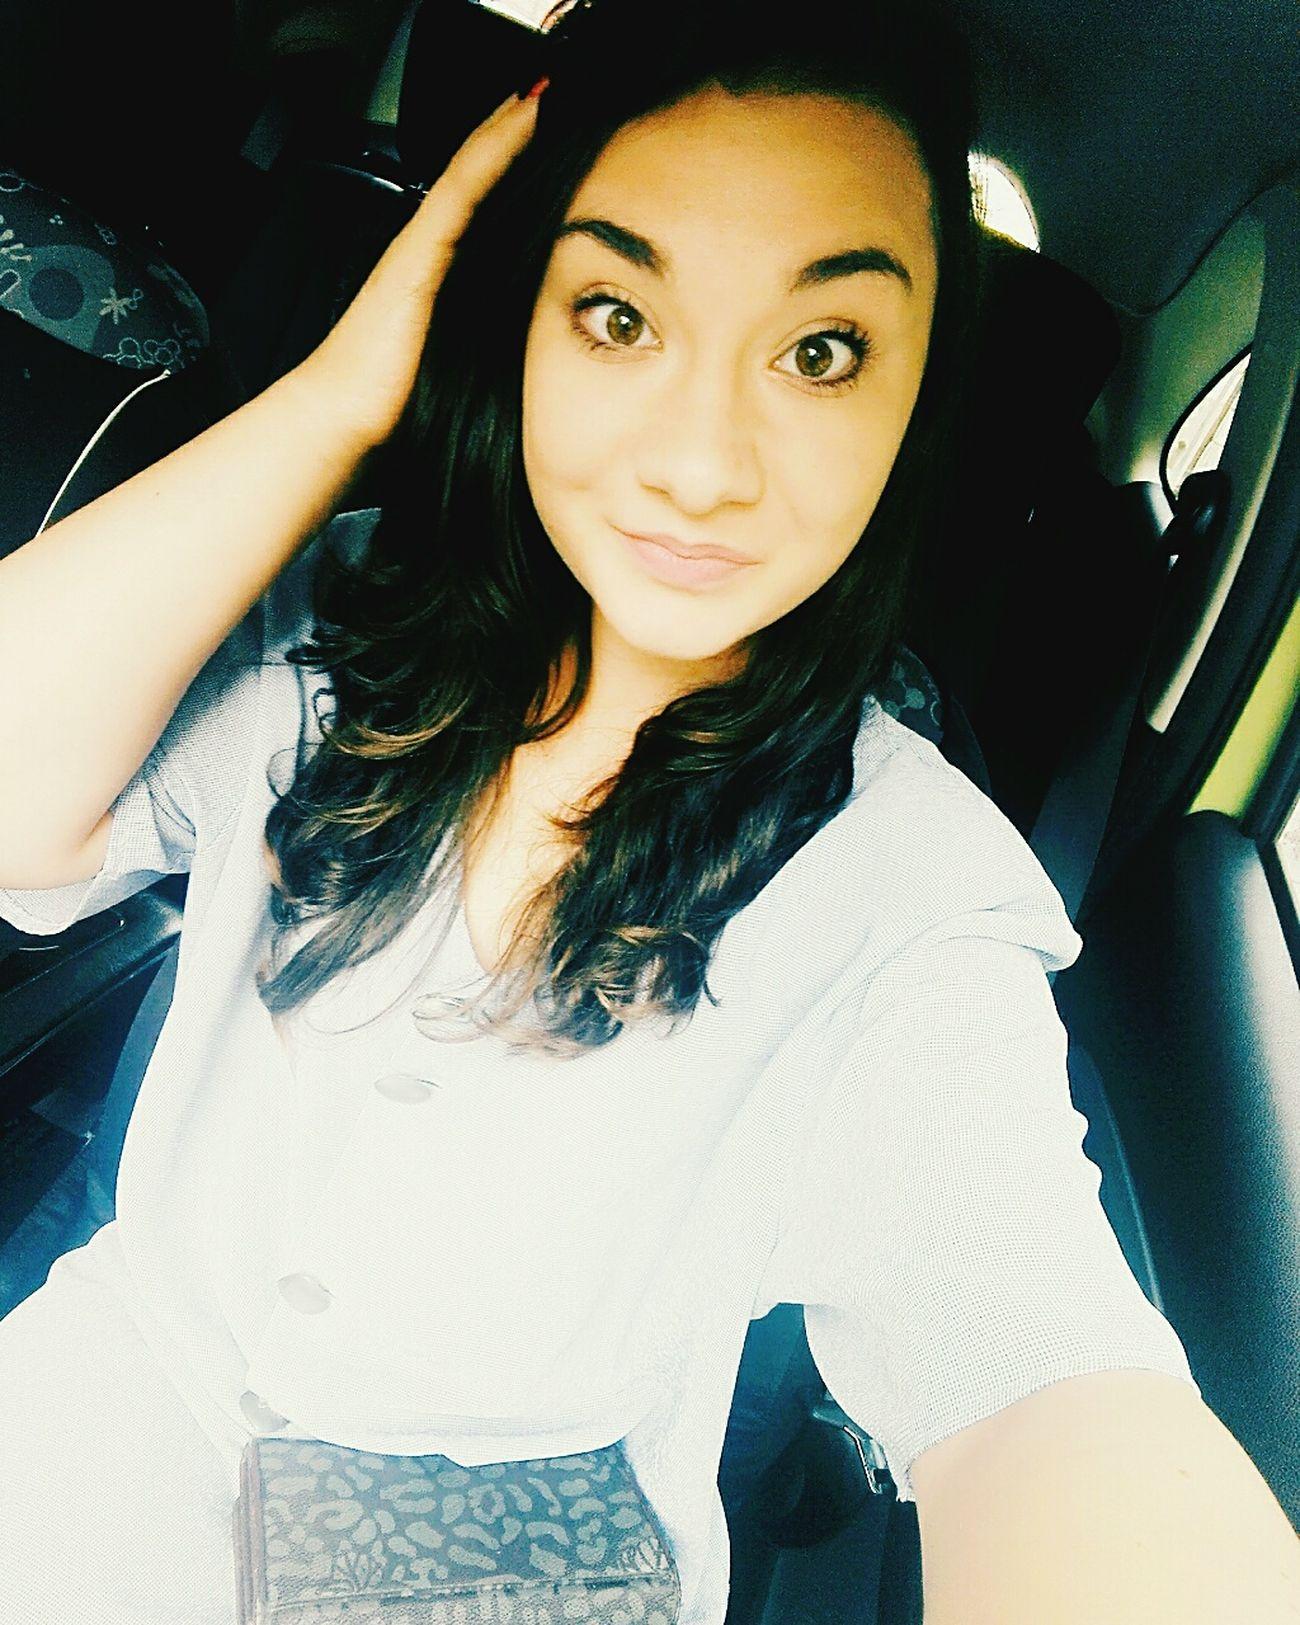 Beauty Person Beautiful People BigNight👌 Pretty Eyes Pretty Girls Big Eyes Cute♡ Missing You Bigday BIGLOVE Good Times BongoParty EyeEm Best Shots EyeEm Nature Lover EyeEm Best Edits EyeEm Best Shots - Black + White Eye Em Nature Lover Casual Clothing - ILoveYou.♡ GoOut❤️ Long Hair Cuteeee♥♡♥ Hair Eyes